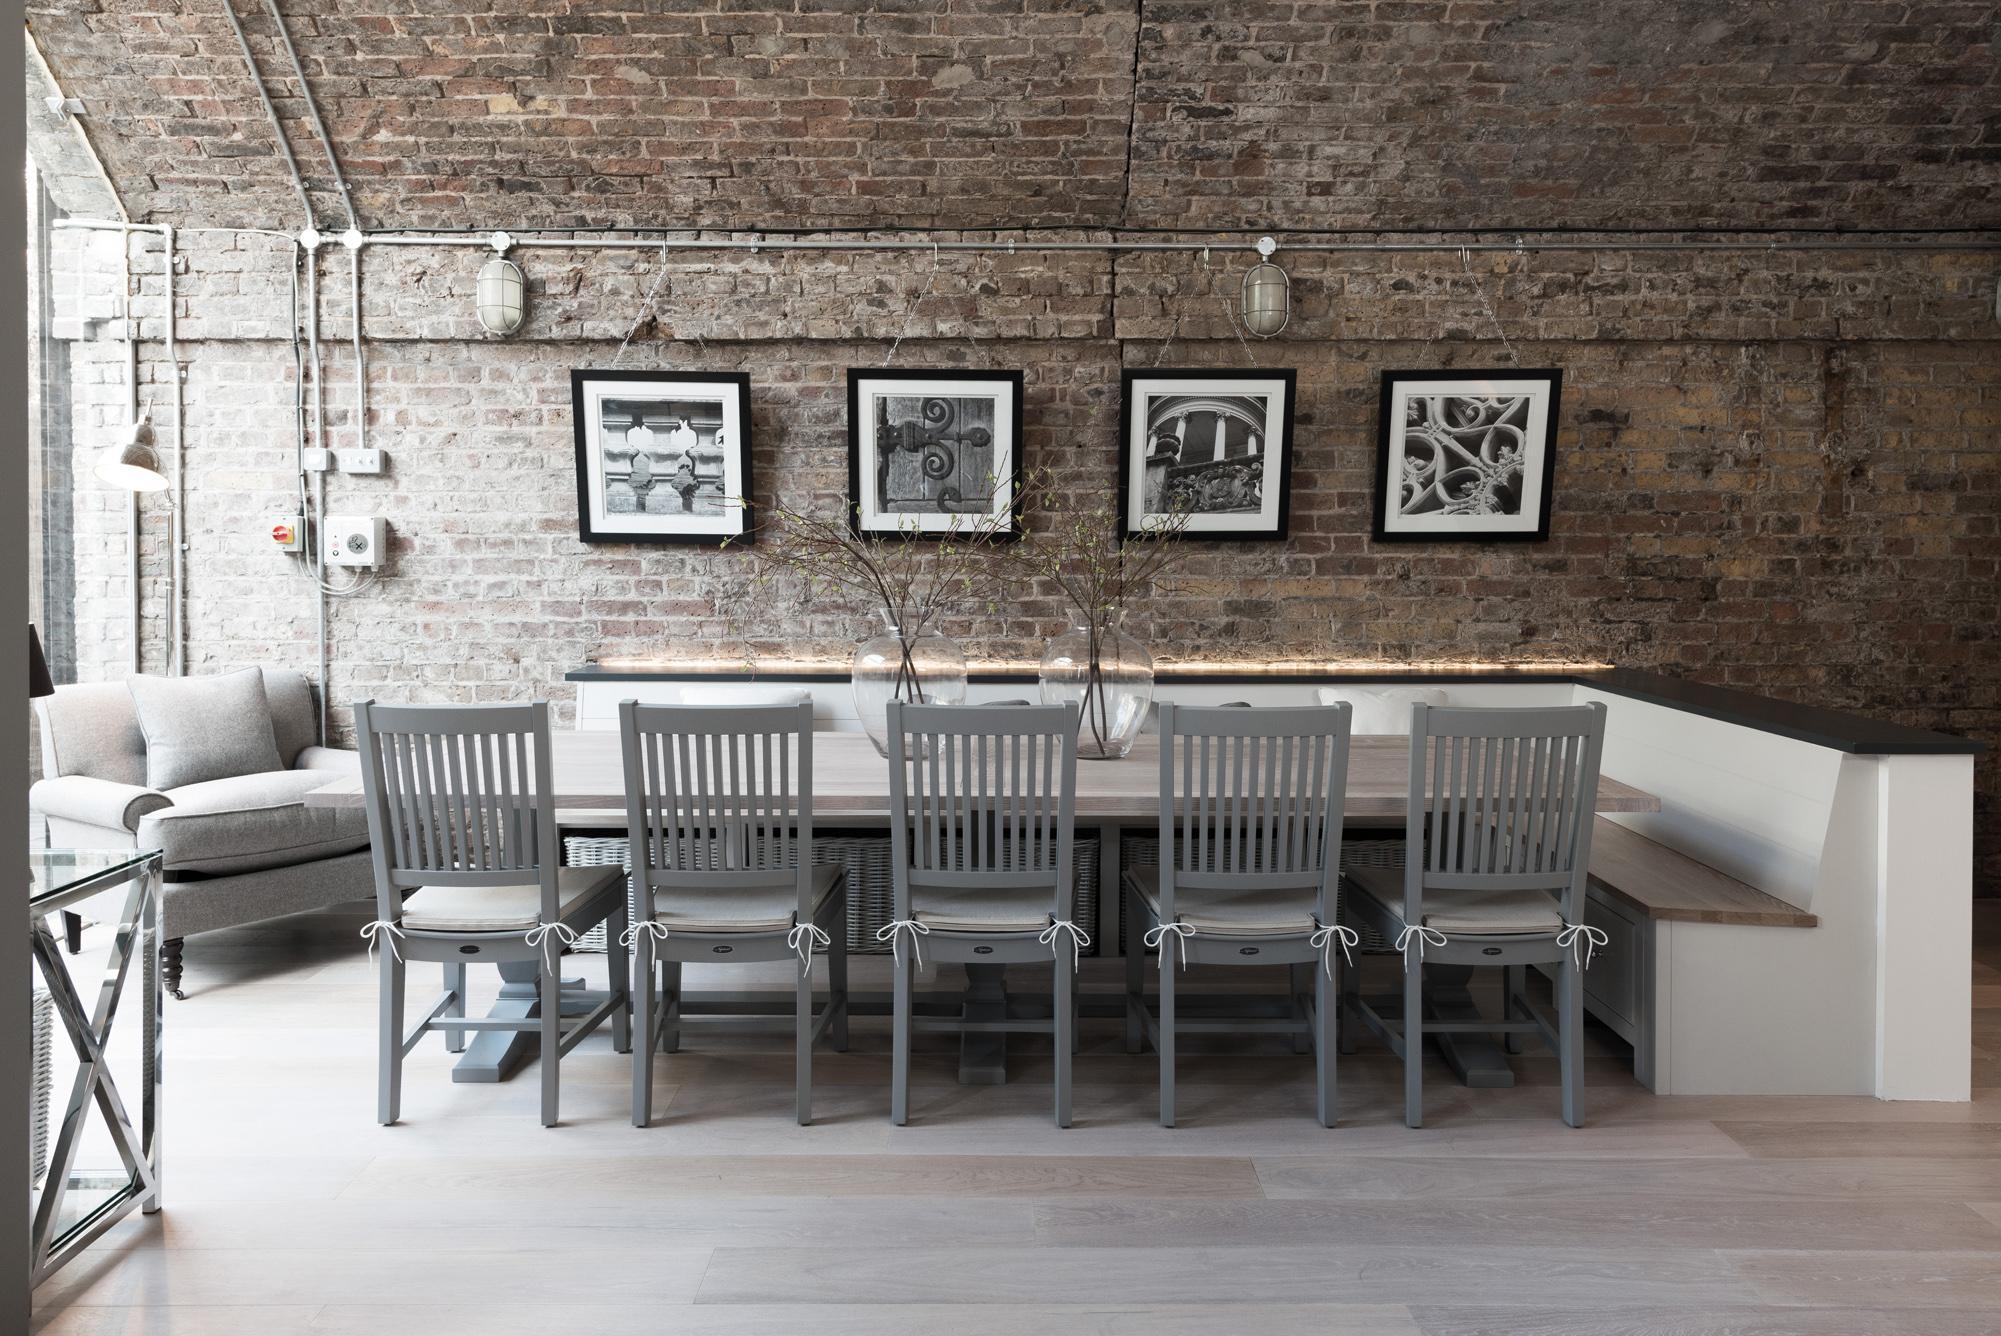 backsteinwand bilder ideen couchstyle. Black Bedroom Furniture Sets. Home Design Ideas